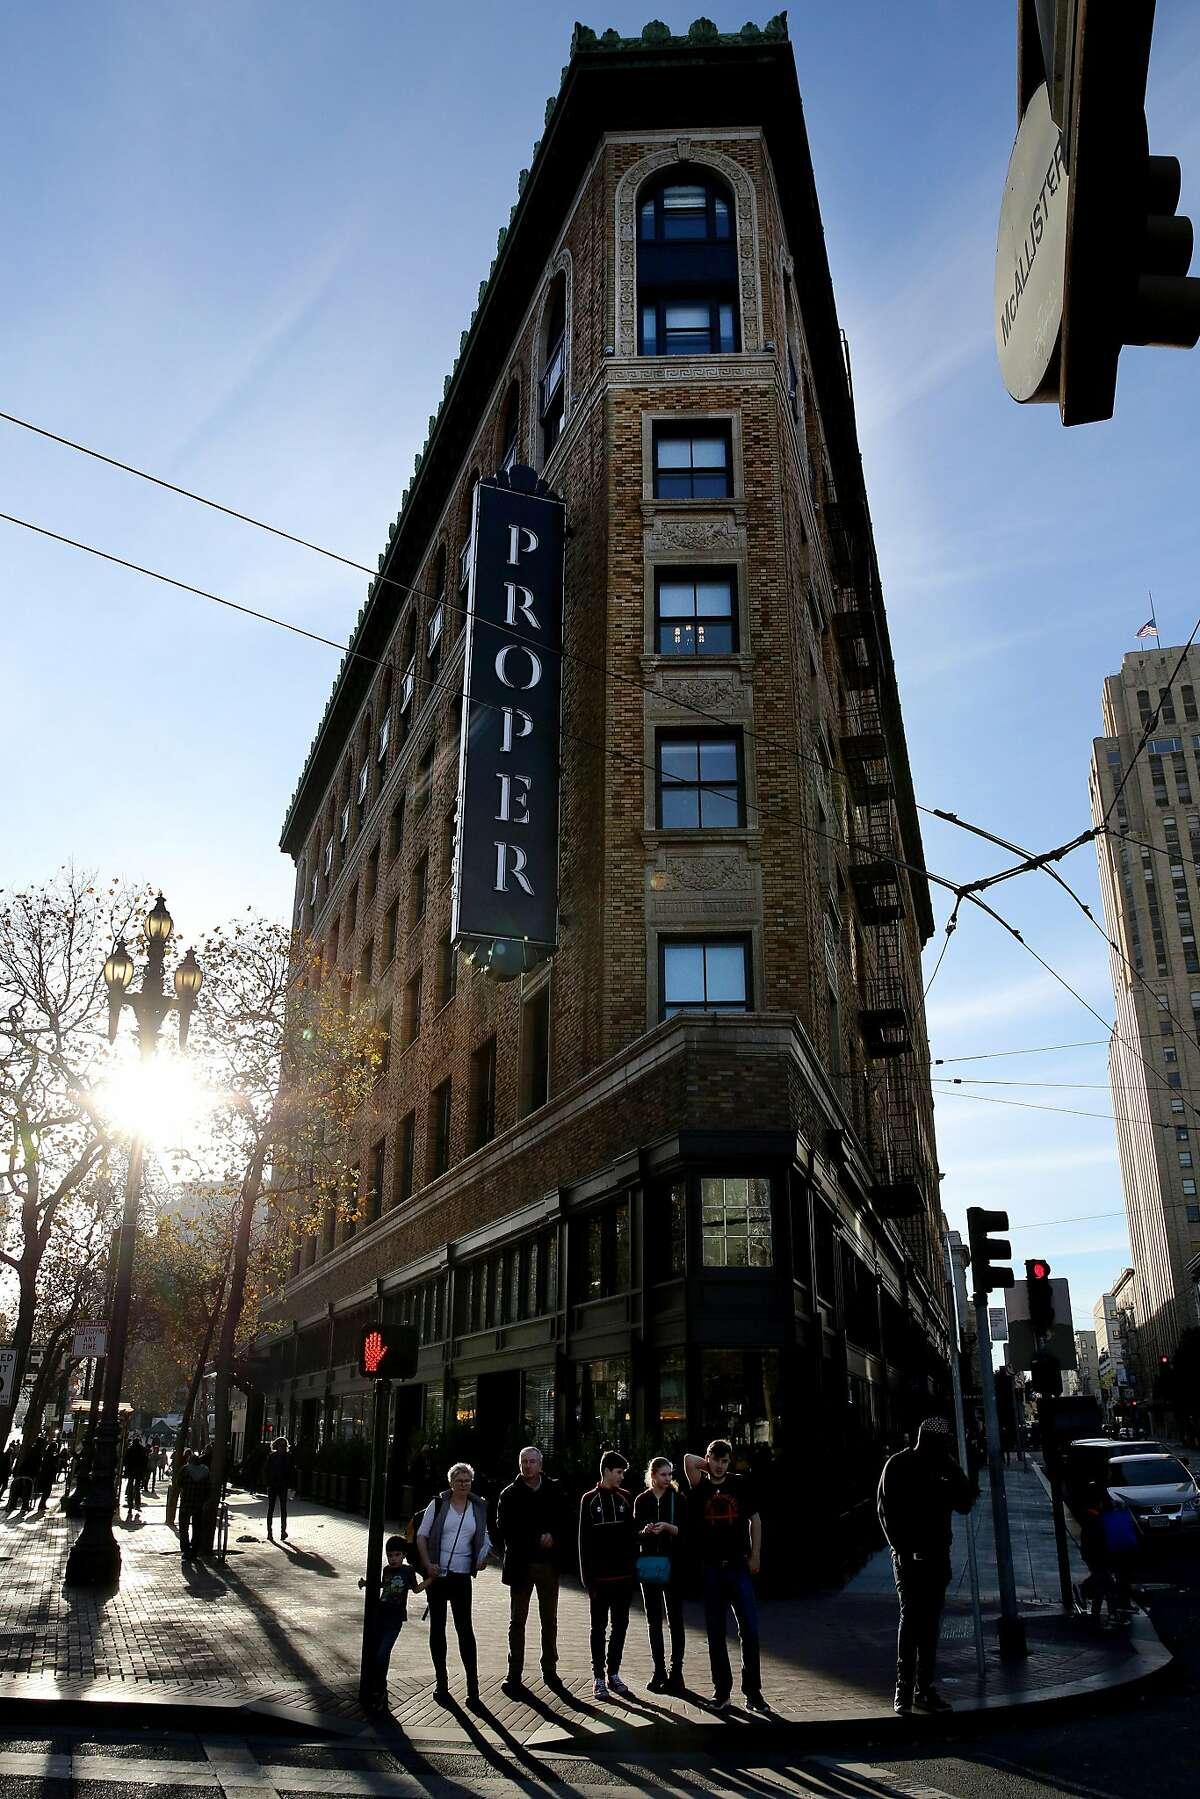 Proper Hotel, Wednesday, Dec. 27, 2017, in San Francisco, Calif.